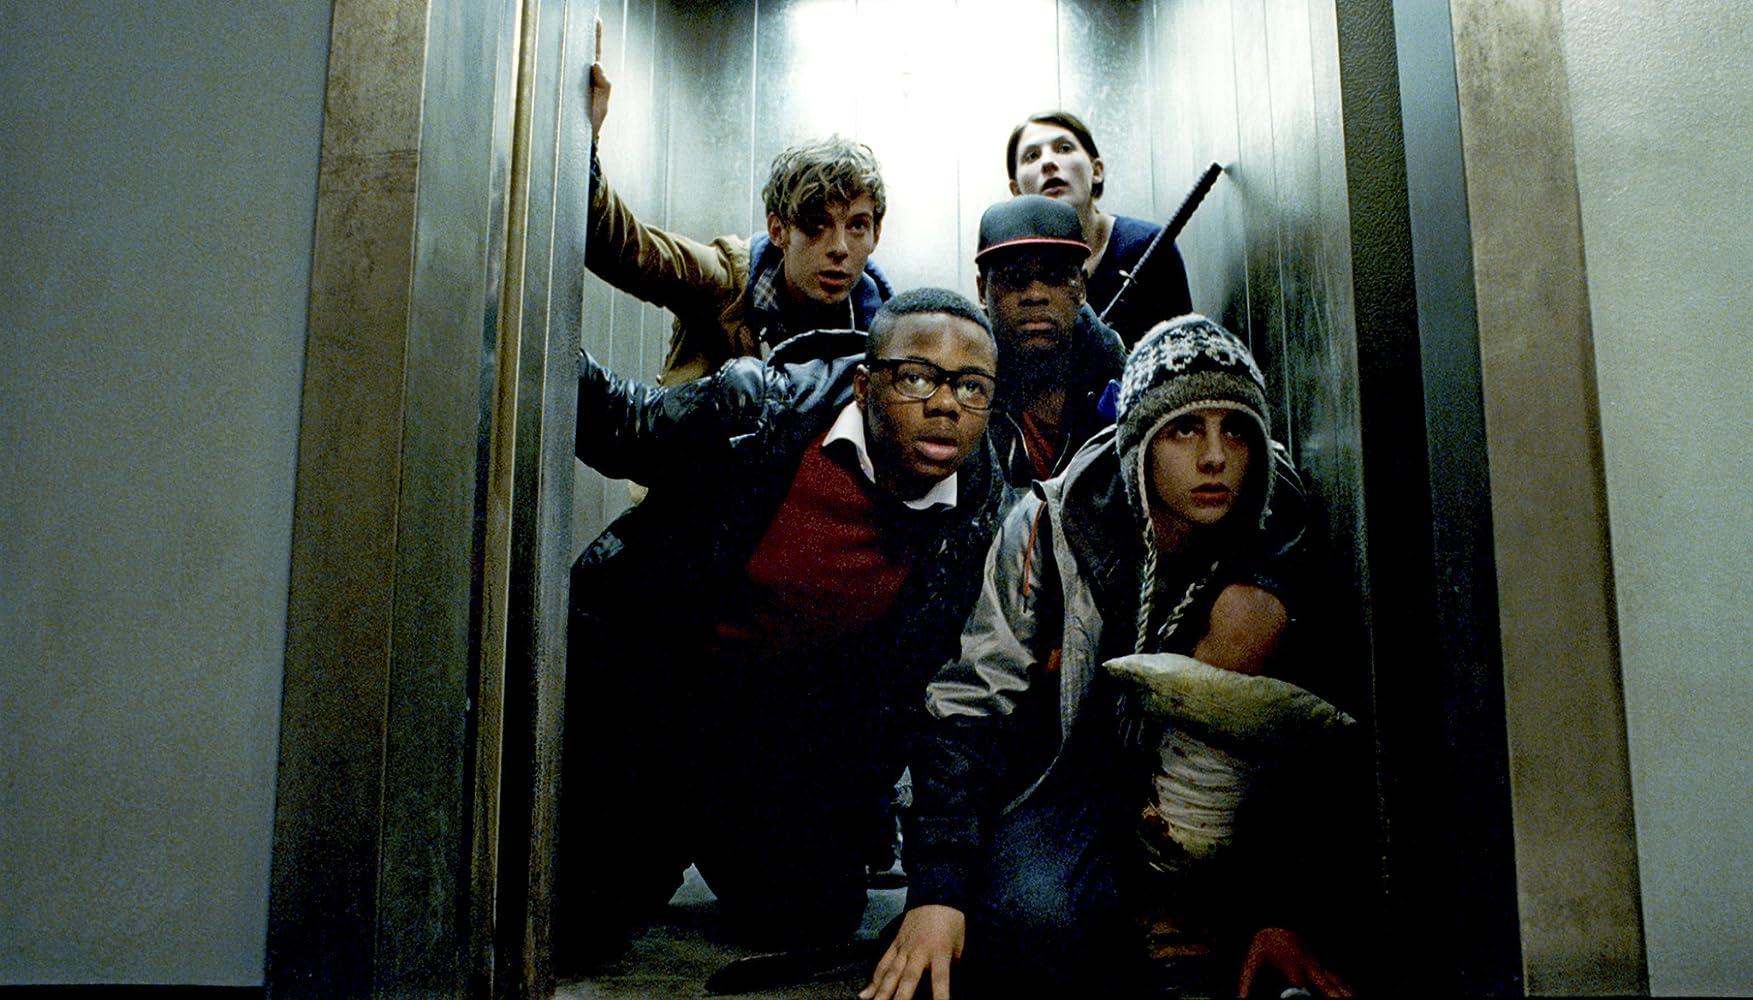 Luke Treadaway, Jodie Whittaker, Alex Esmail, Leeon Jones, and John Boyega in Attack the Block (2011)